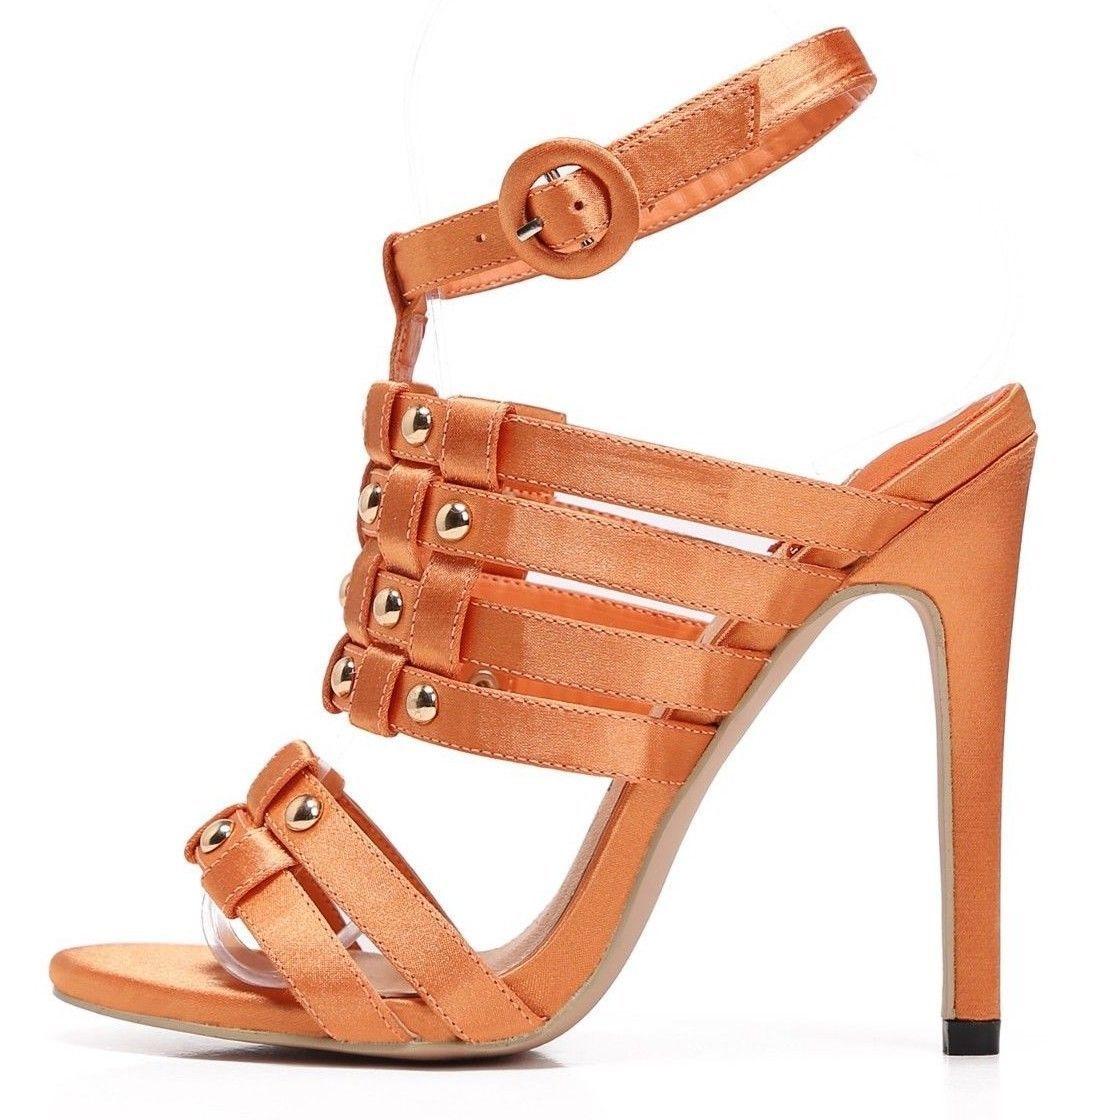 428926b8f7a8 Mac J Light Orange Woven Strap Slip On High Heel Shoe With Ankle Strap